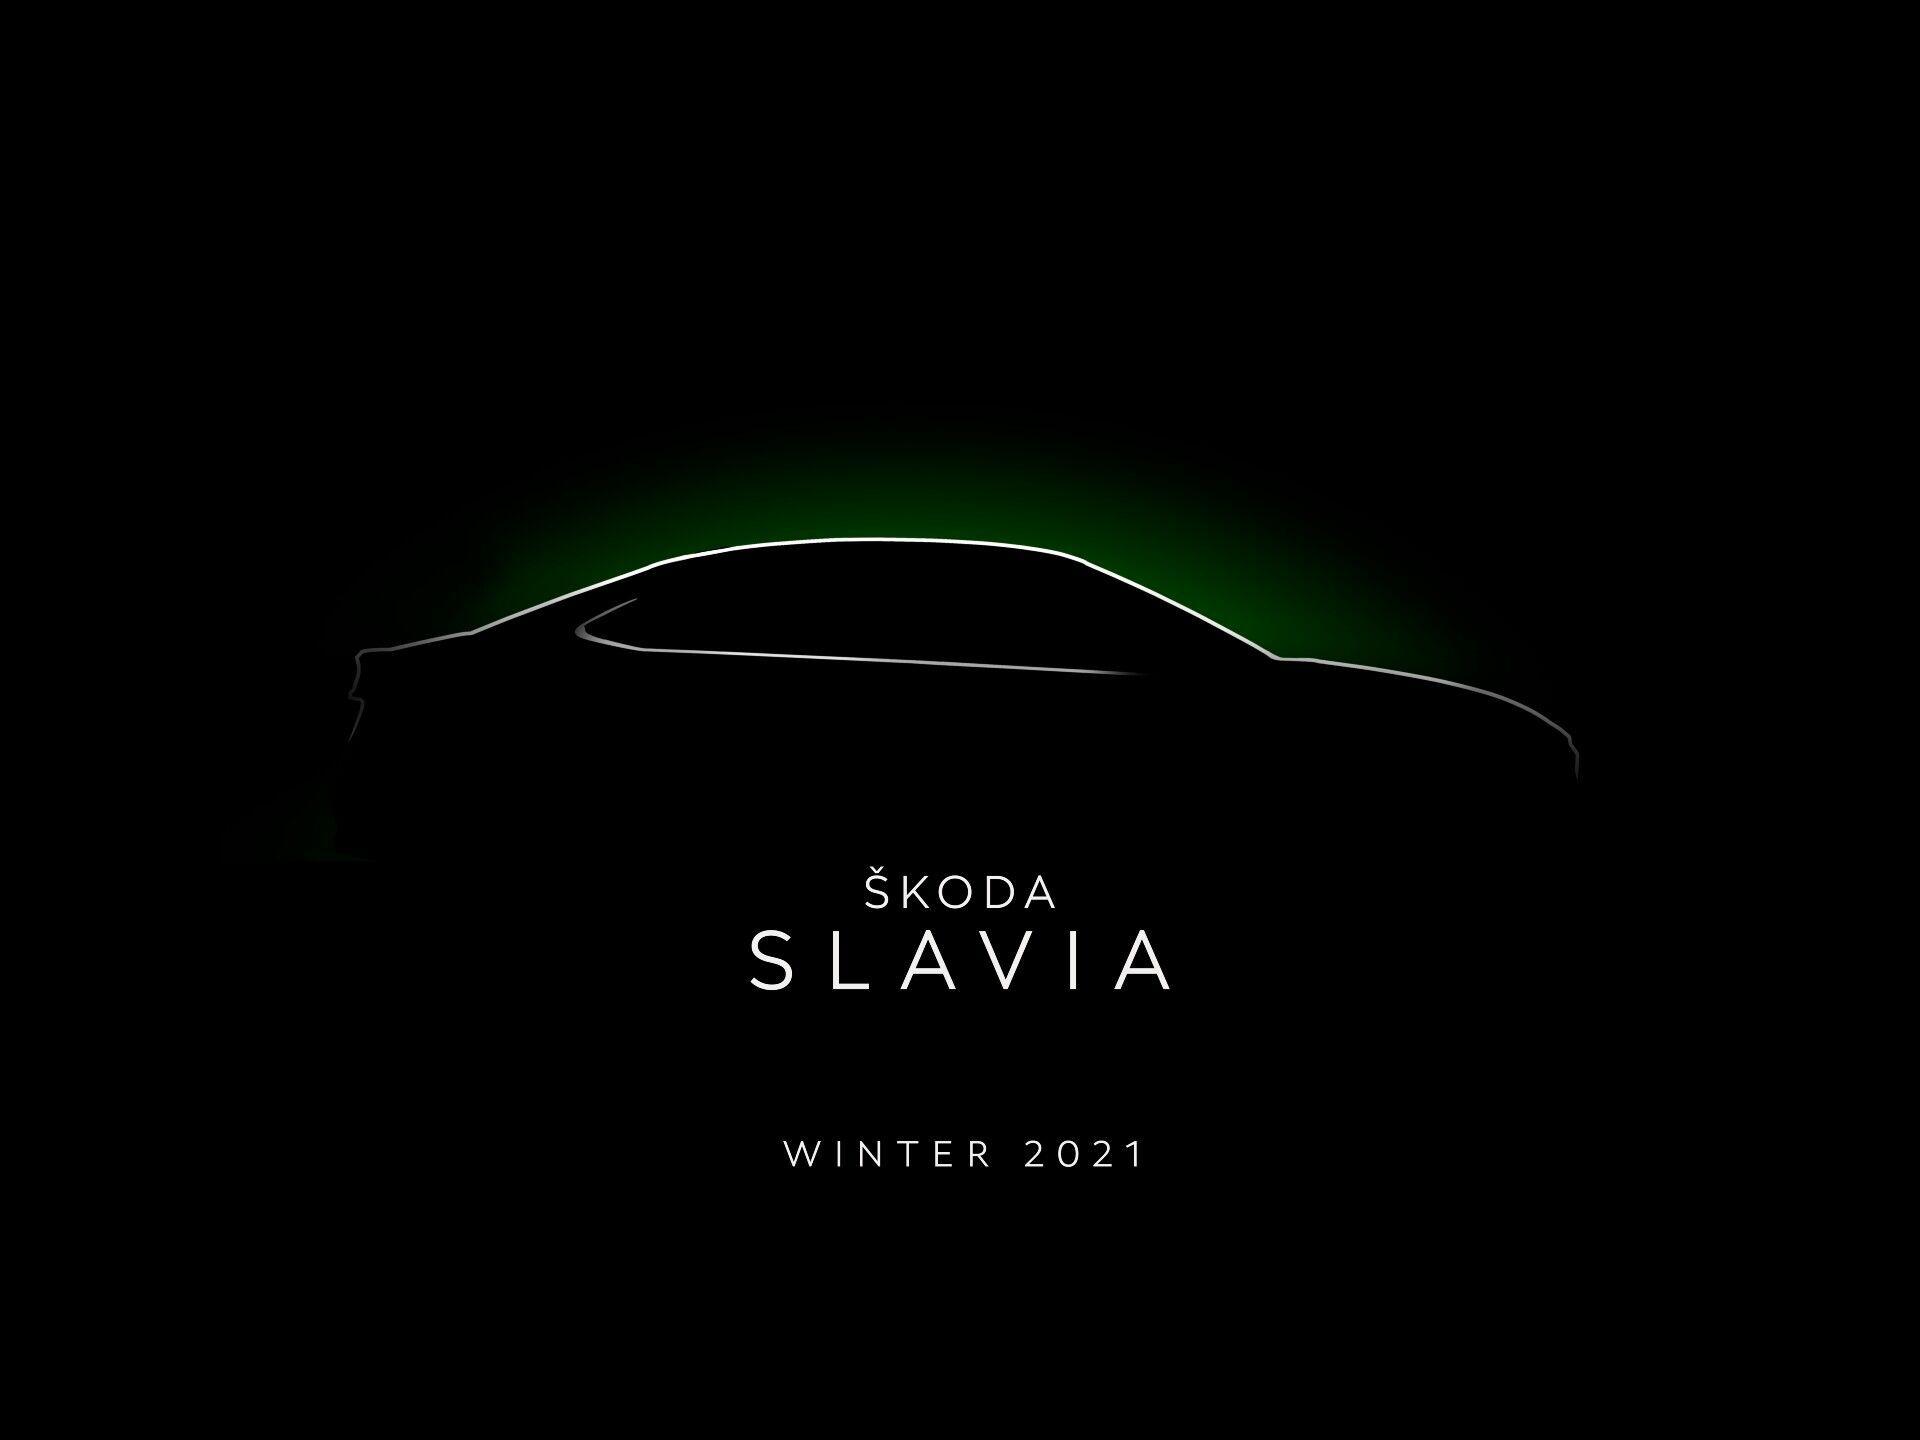 Презентация модели Skoda Slavia запланирована зимой